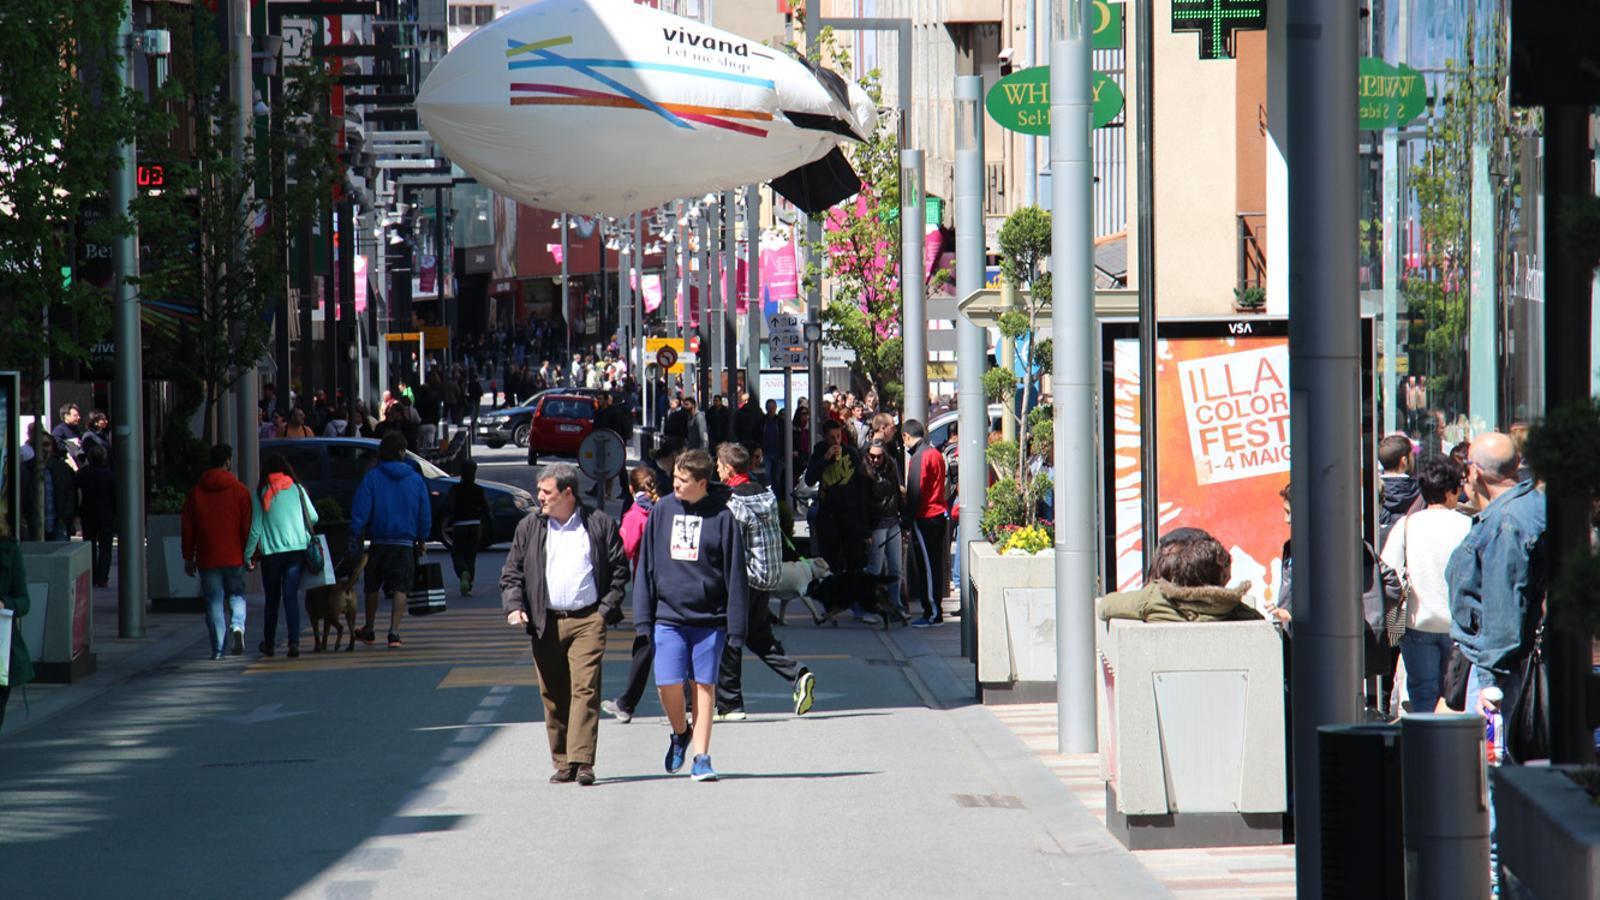 L'avinguda Carlemany aquest dissabte. / G.L.T. (ANA)